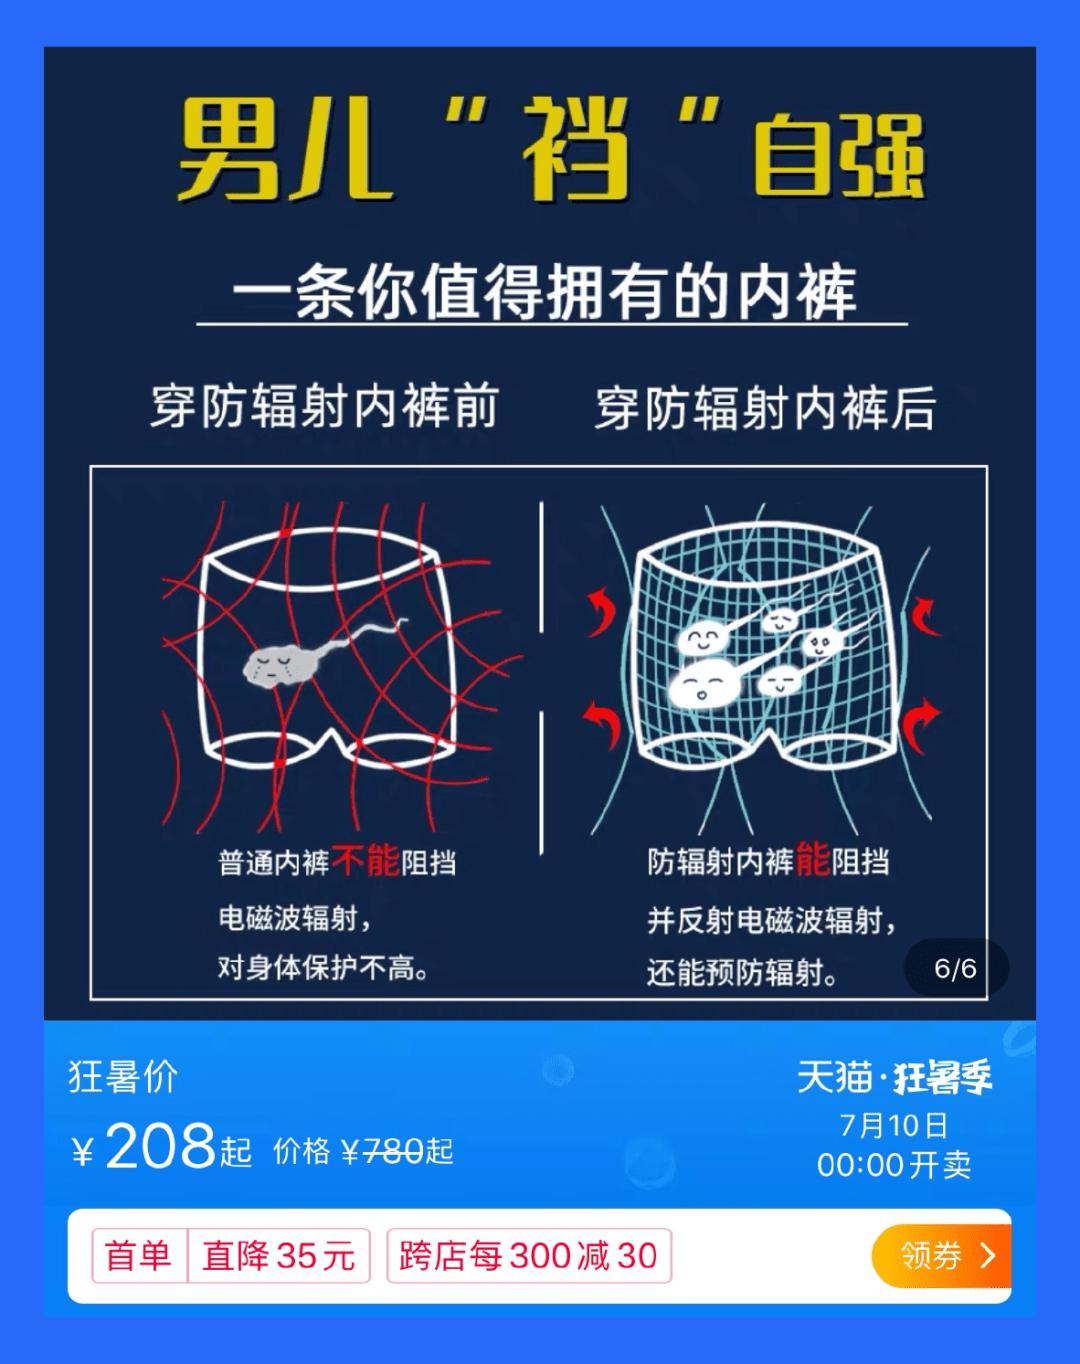 5G都来了,怎么还有人在网上买防辐射内裤